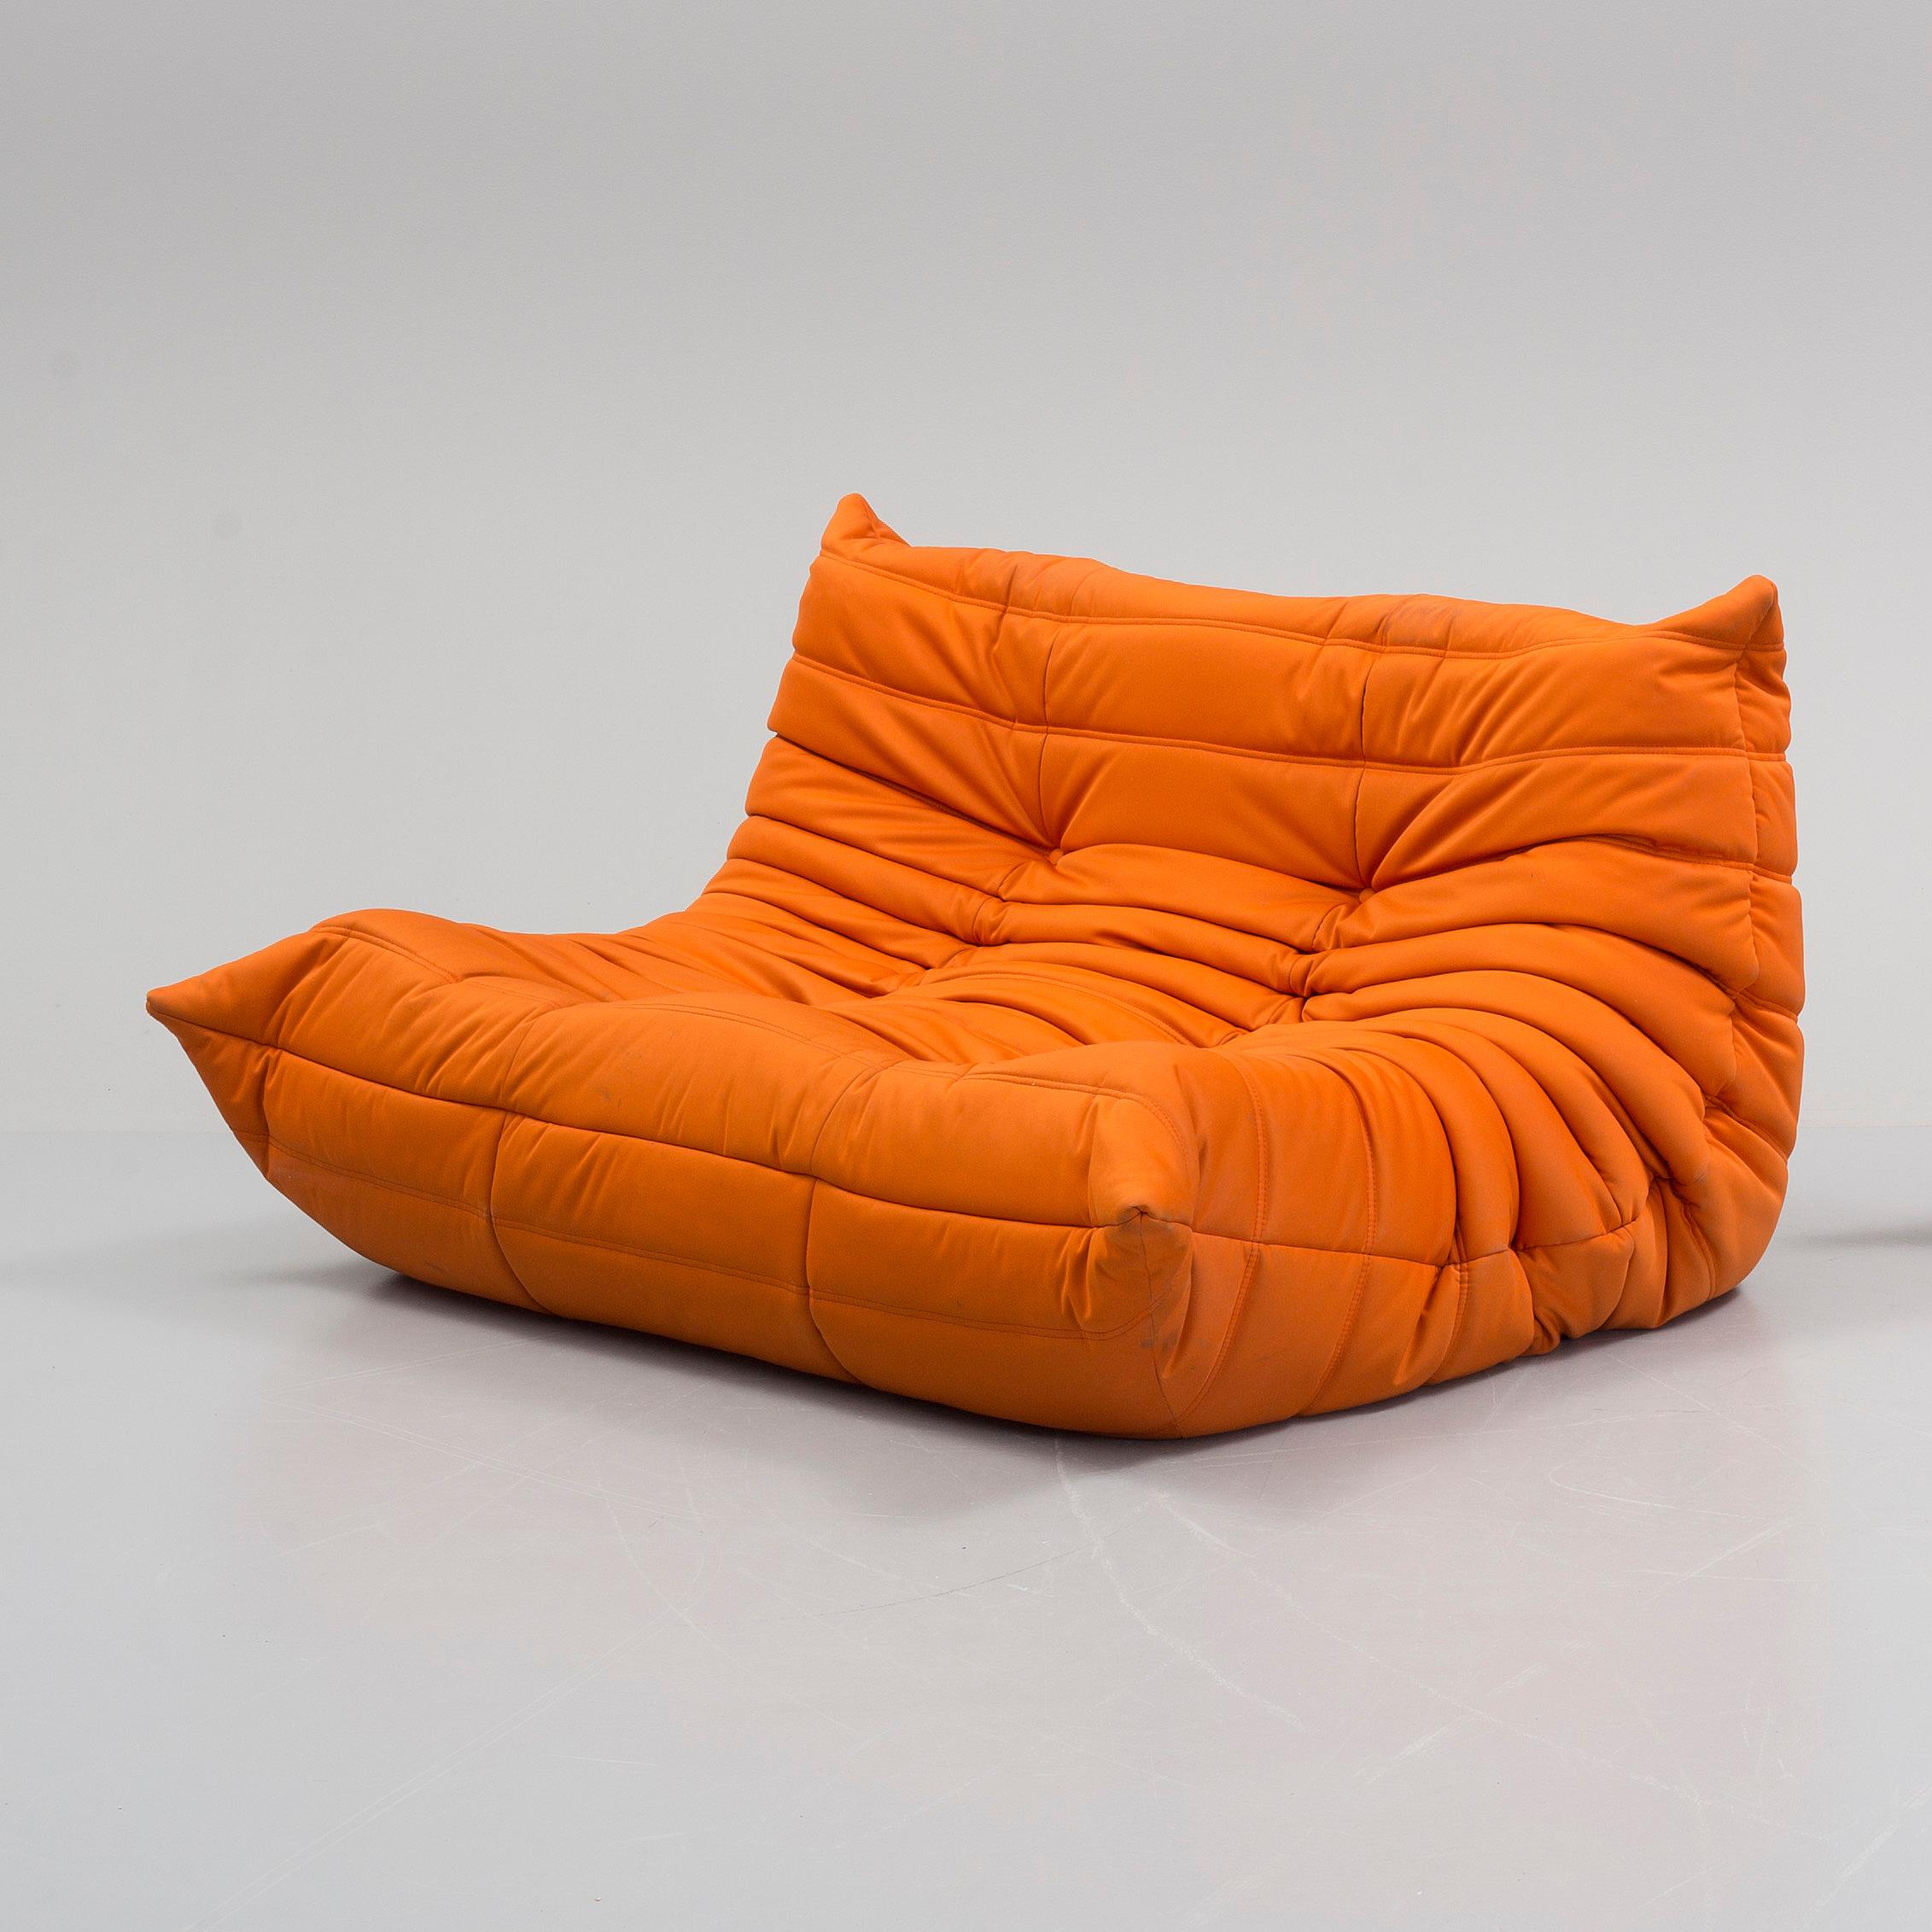 Full Size of Ligne Roset Togo Chair For Sale Gebraucht Mini Sofa Ireland Occasion Ebay Reproduction Sessel A By Michel Ducaroy Bukowskis Wohnzimmer Ligne Roset Togo